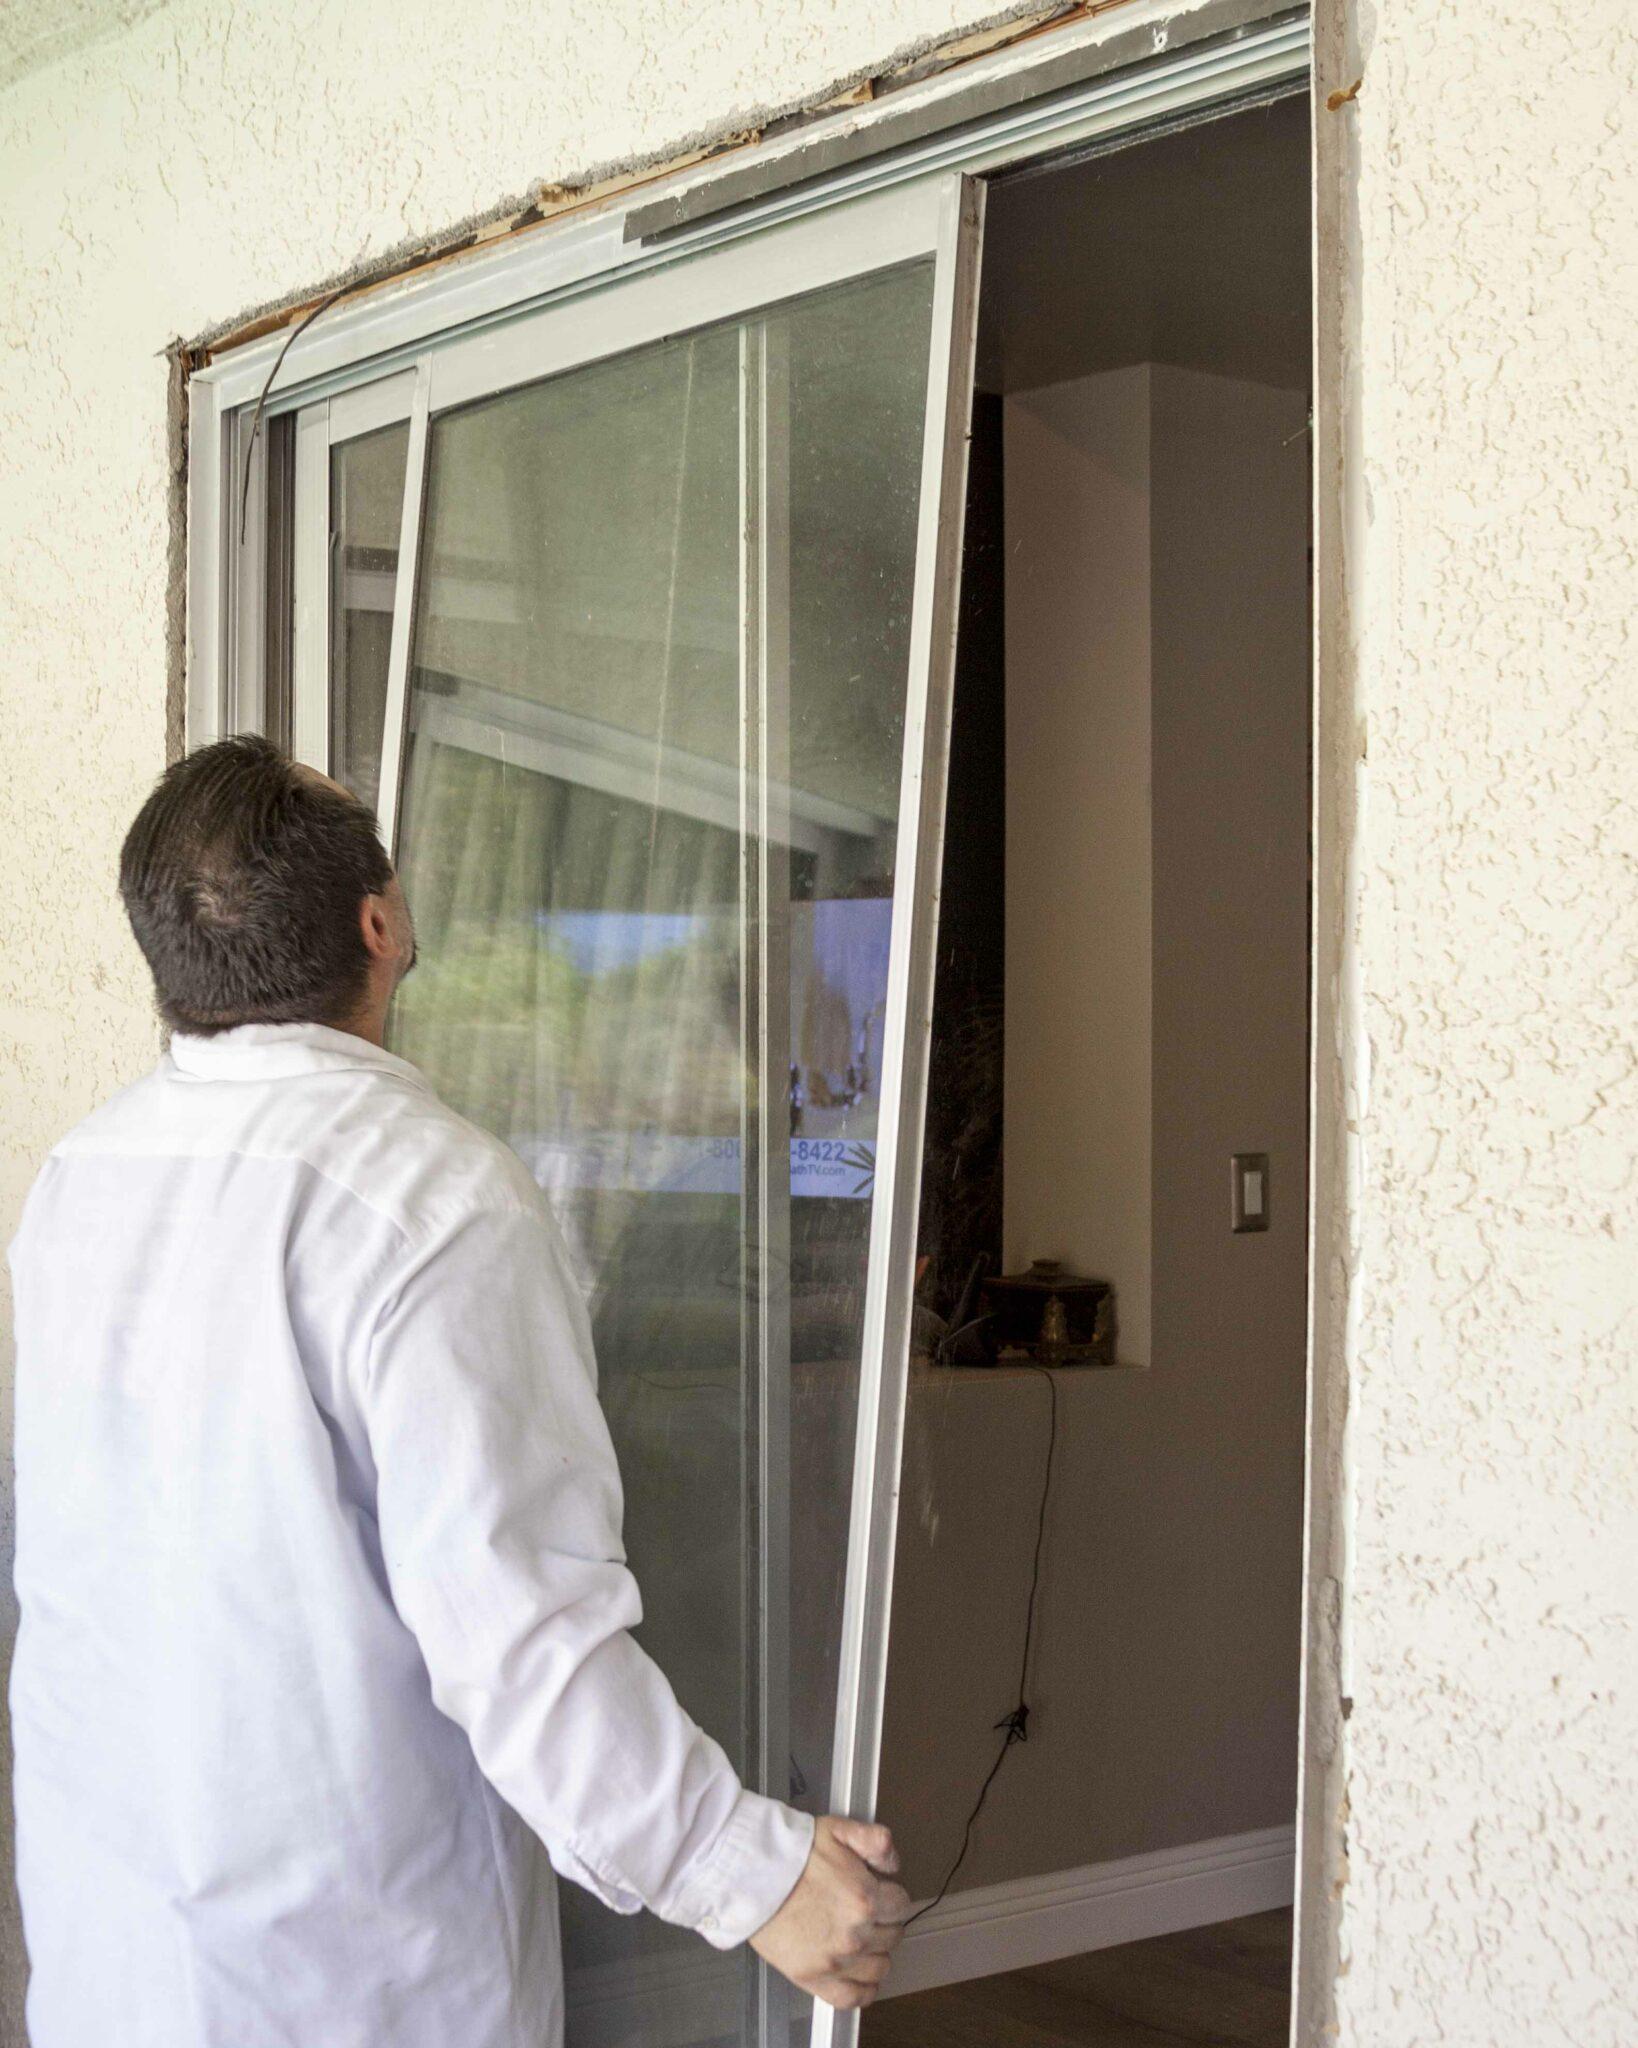 replacement windows and doors in Camarillo , CA.